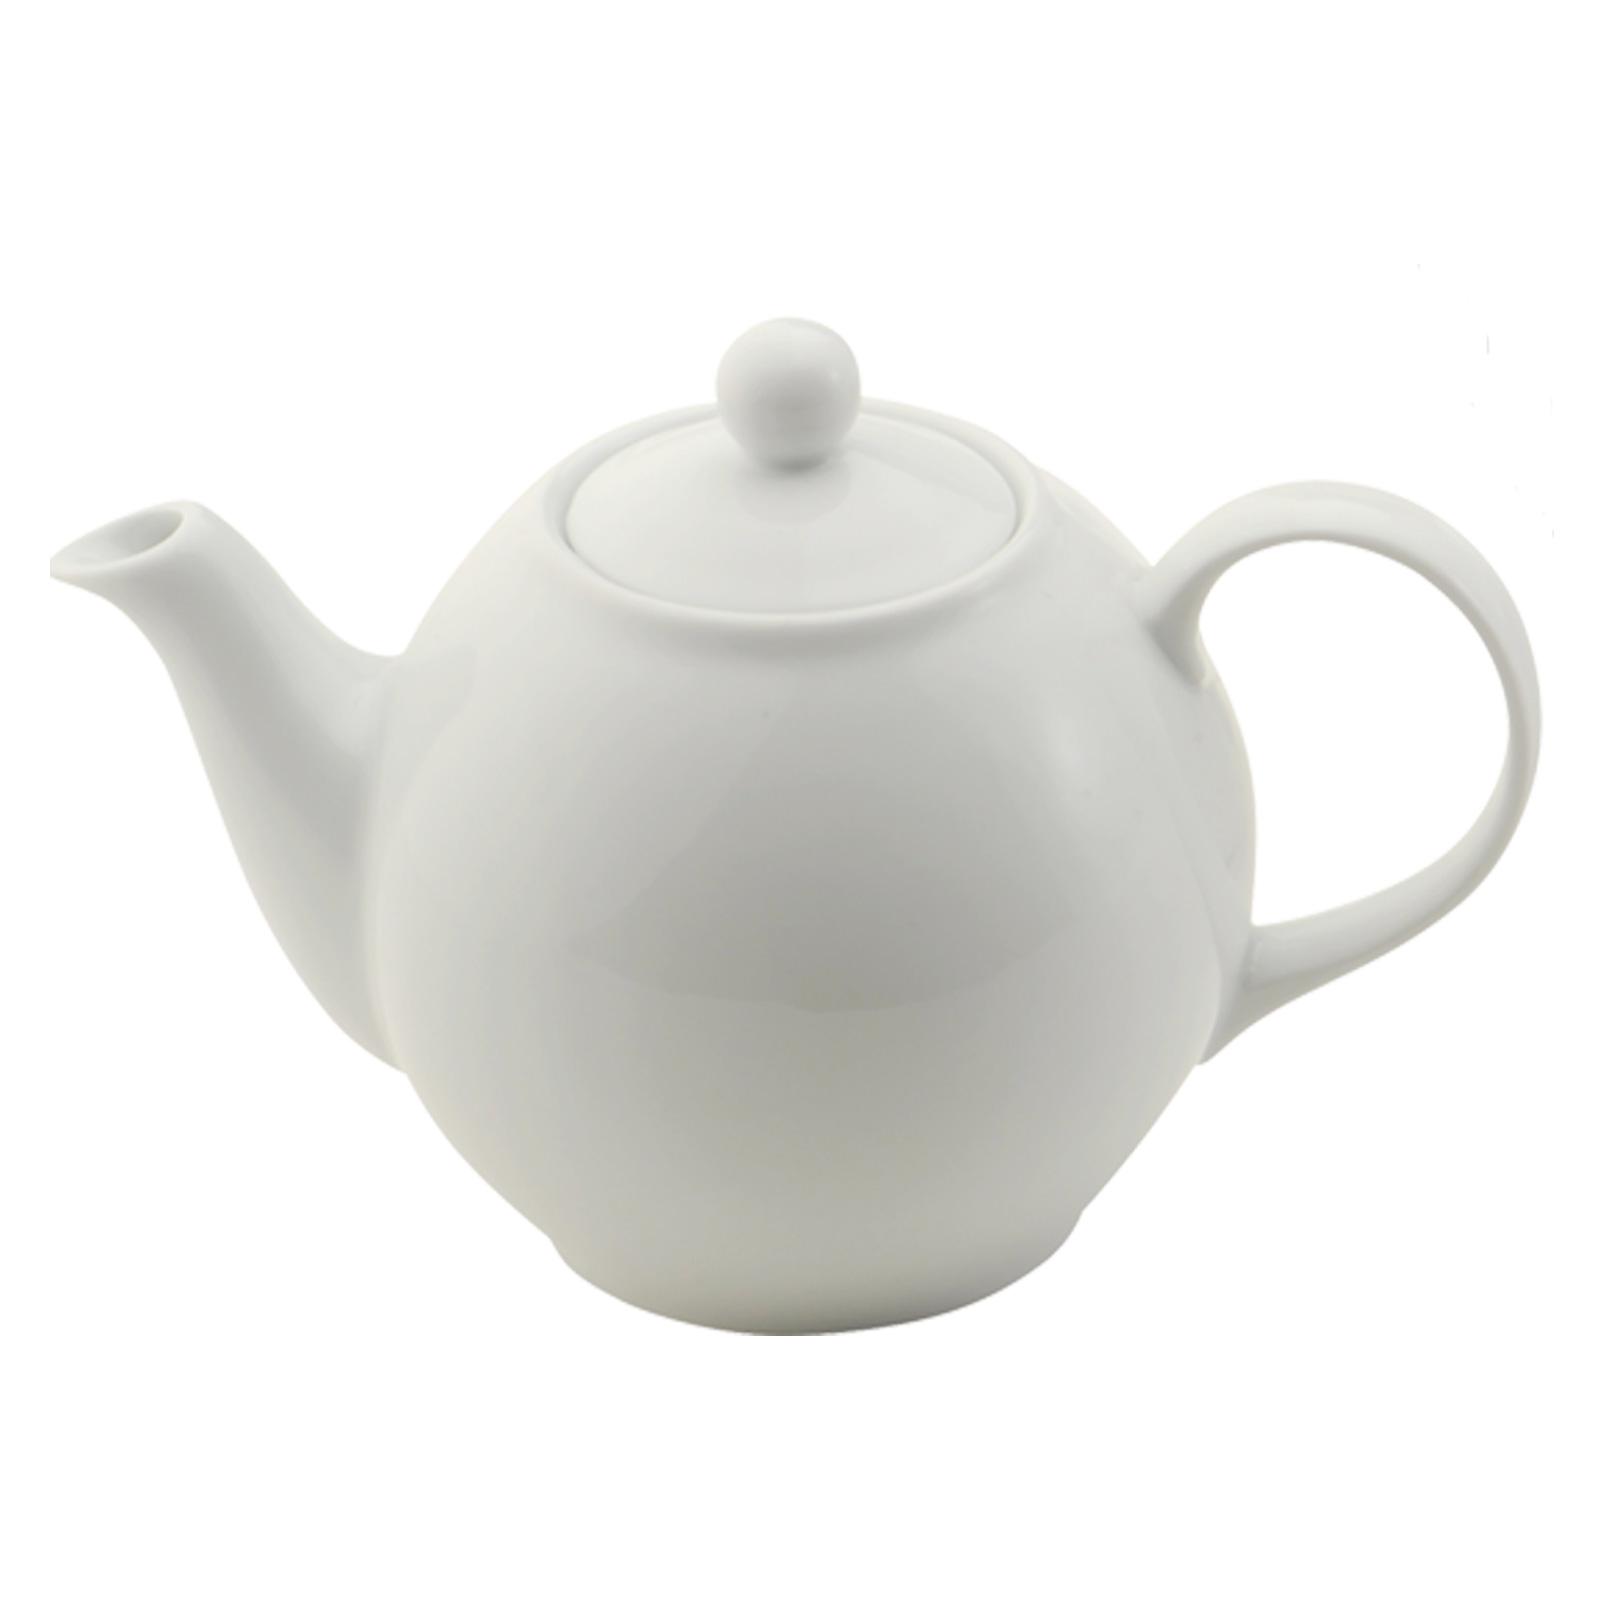 Orbit Teapot Medium by BIA